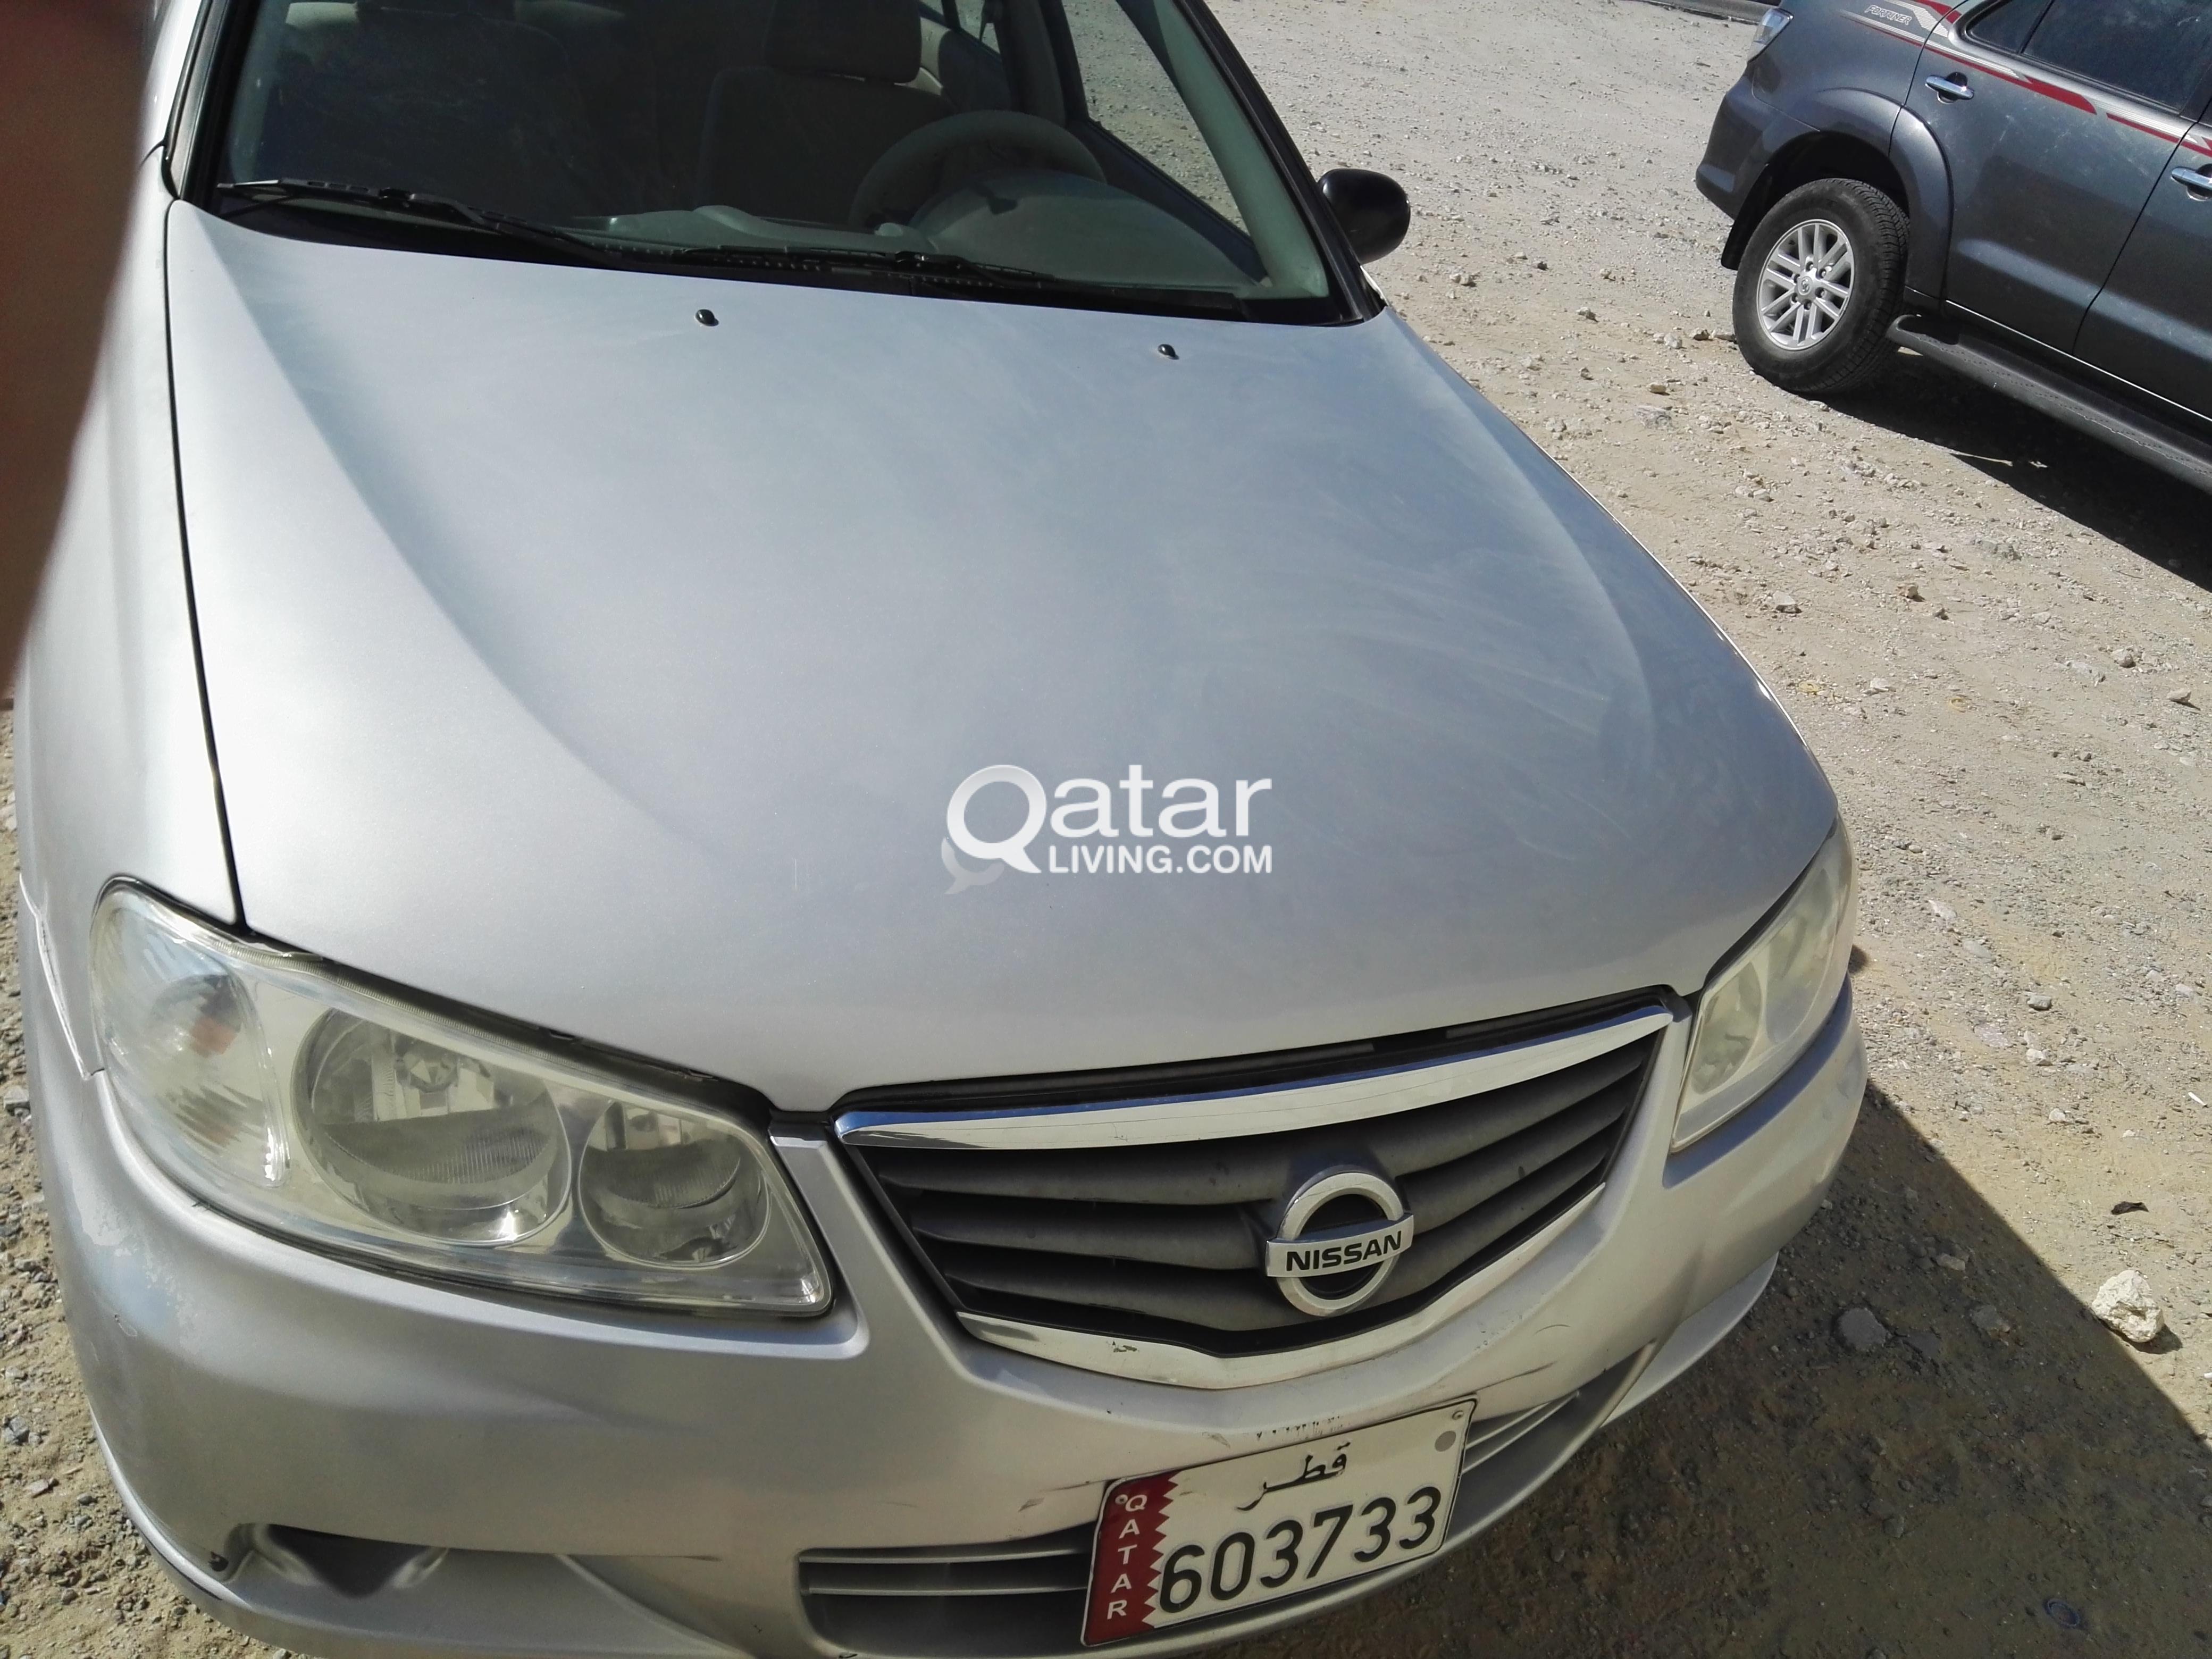 Nissan Sunny 2011 Japan Made For Sale Qatar Living